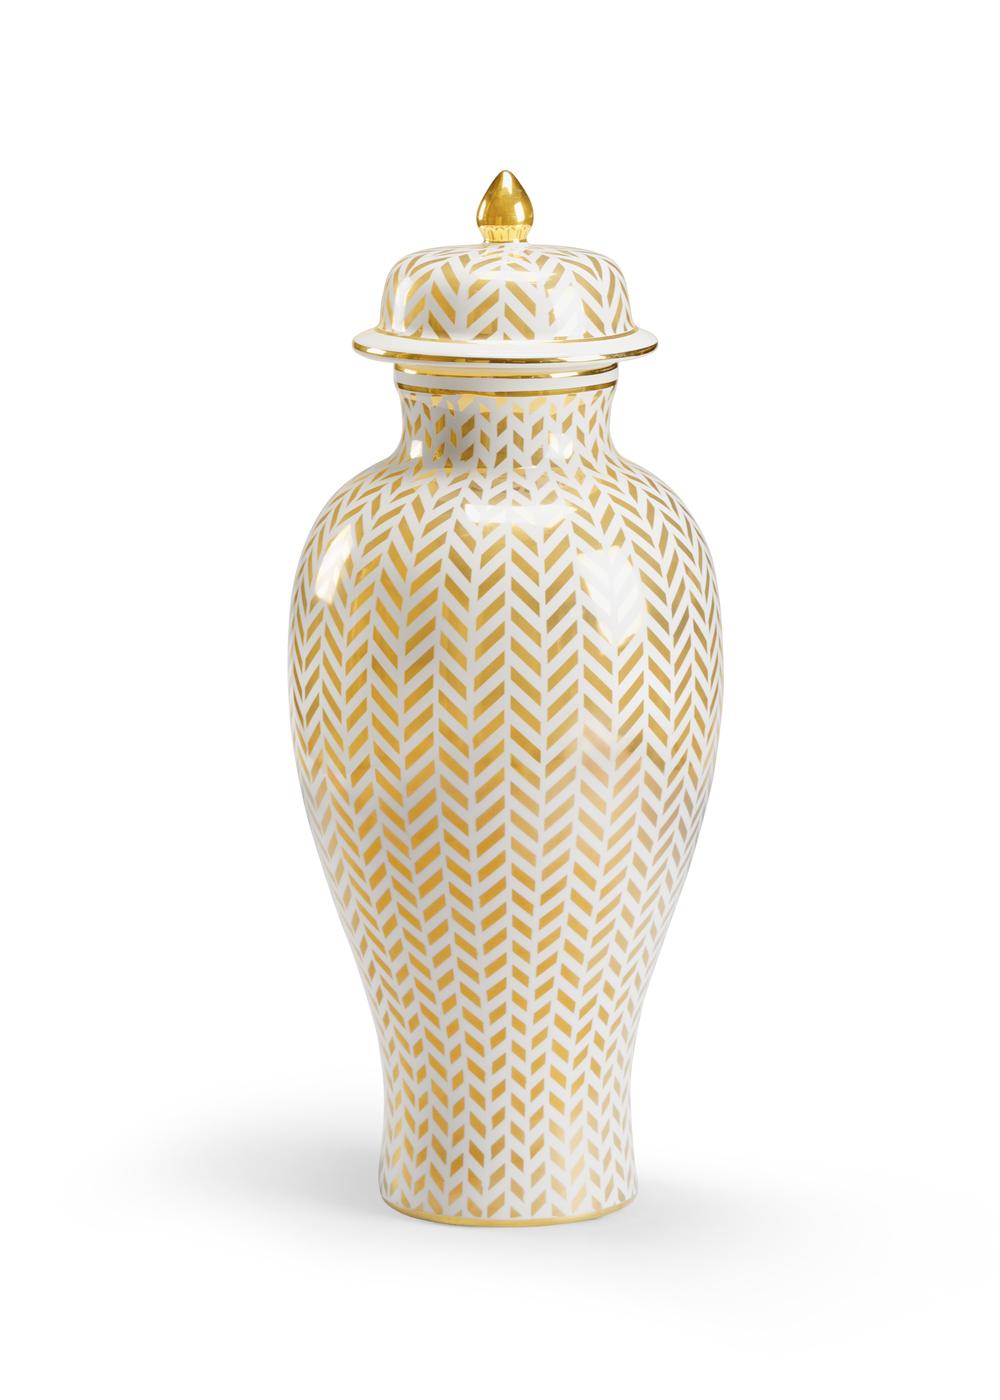 Chelsea House - Herringbone Vase